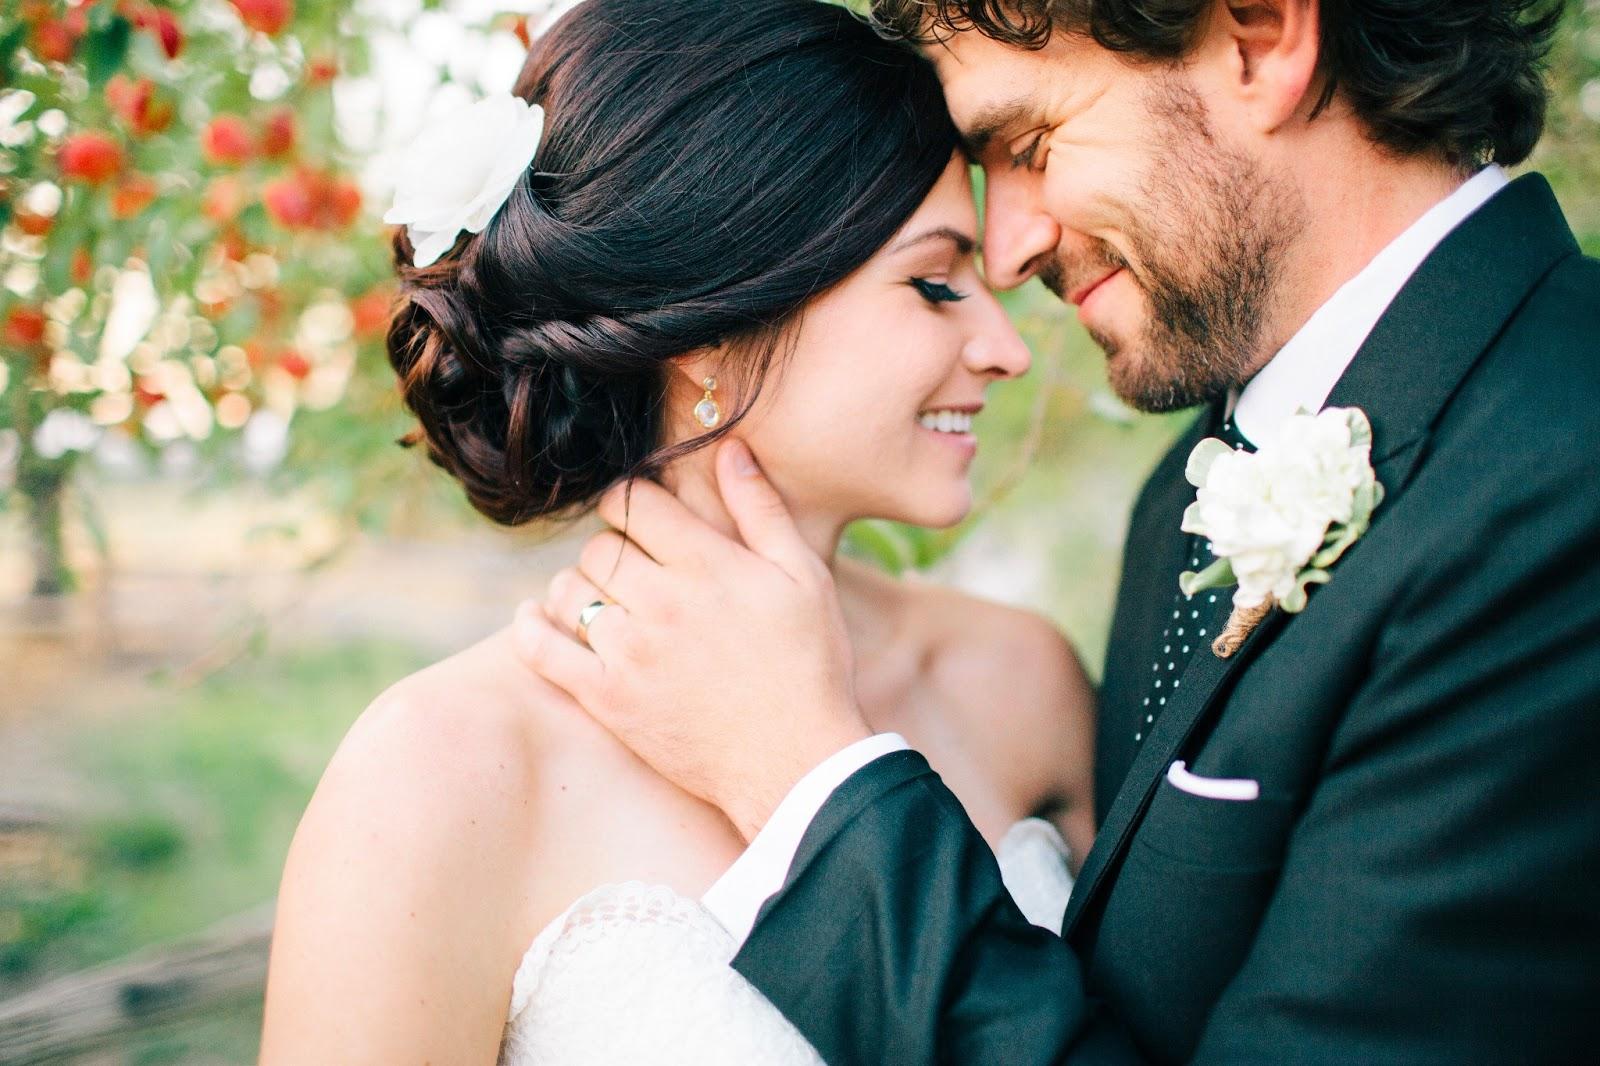 Traditions d'un mariage ukrainien moderne